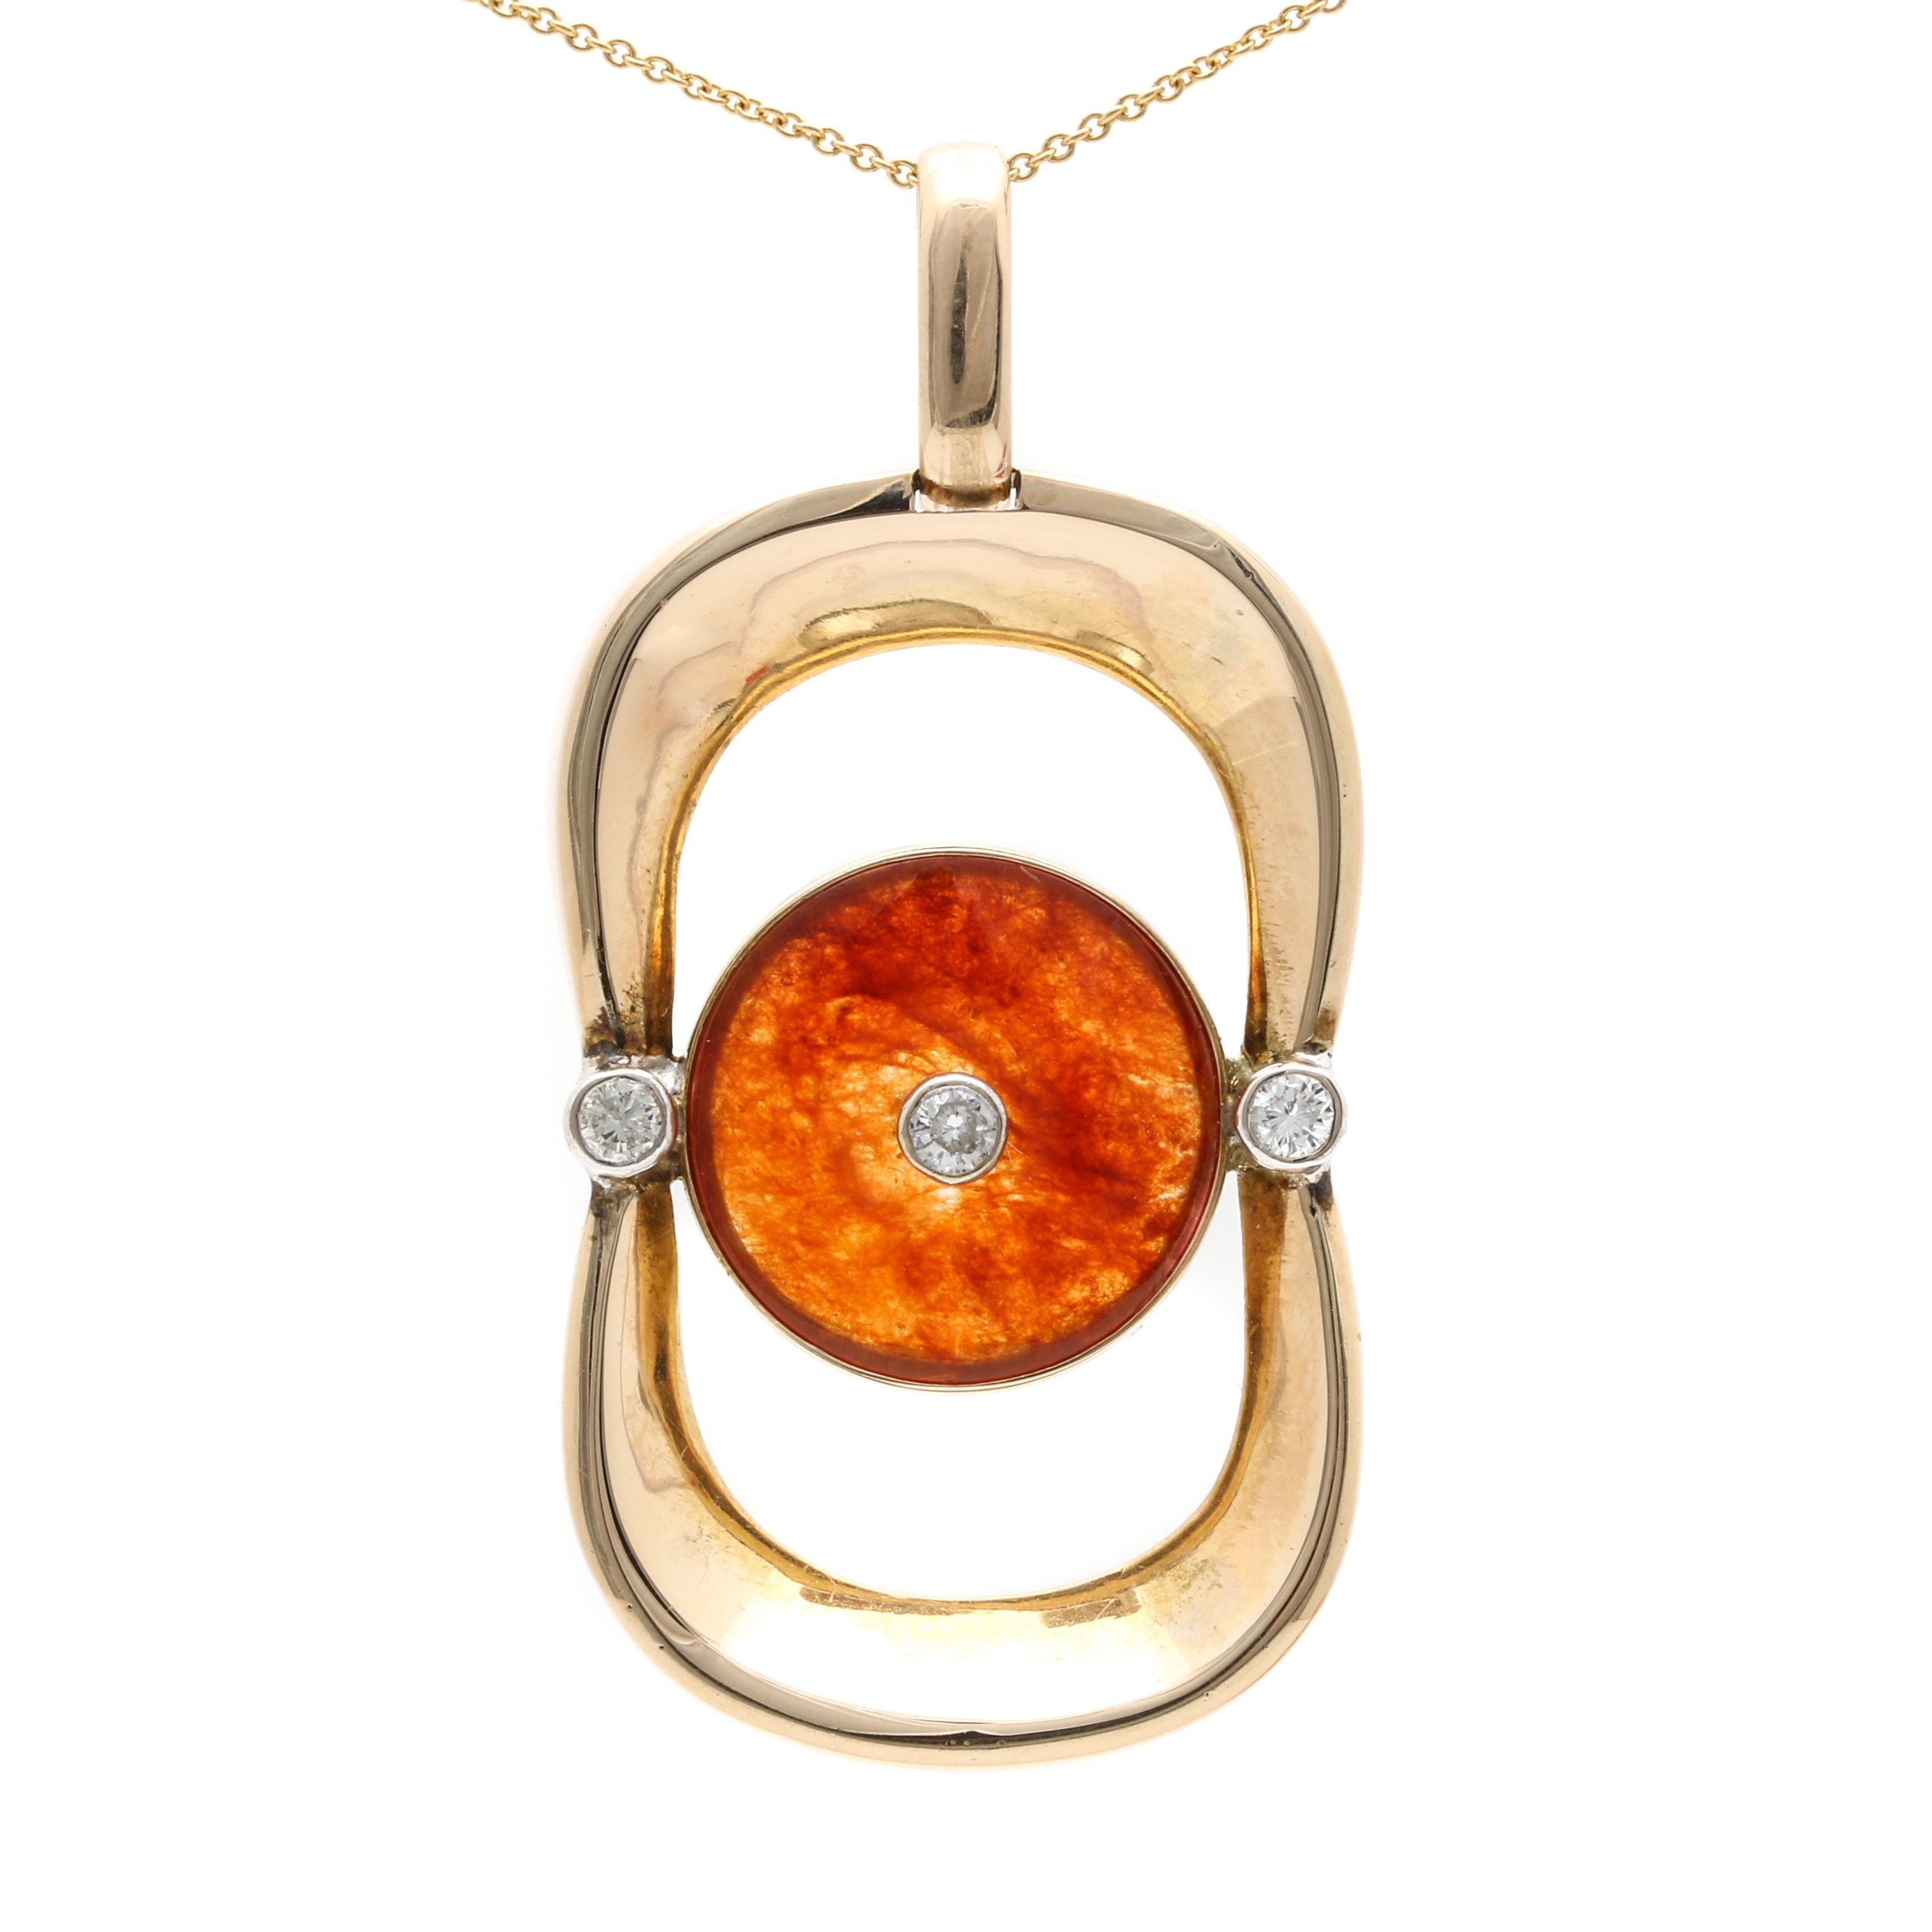 14K Yellow Gold Jadeite and Diamond Pendant Necklace